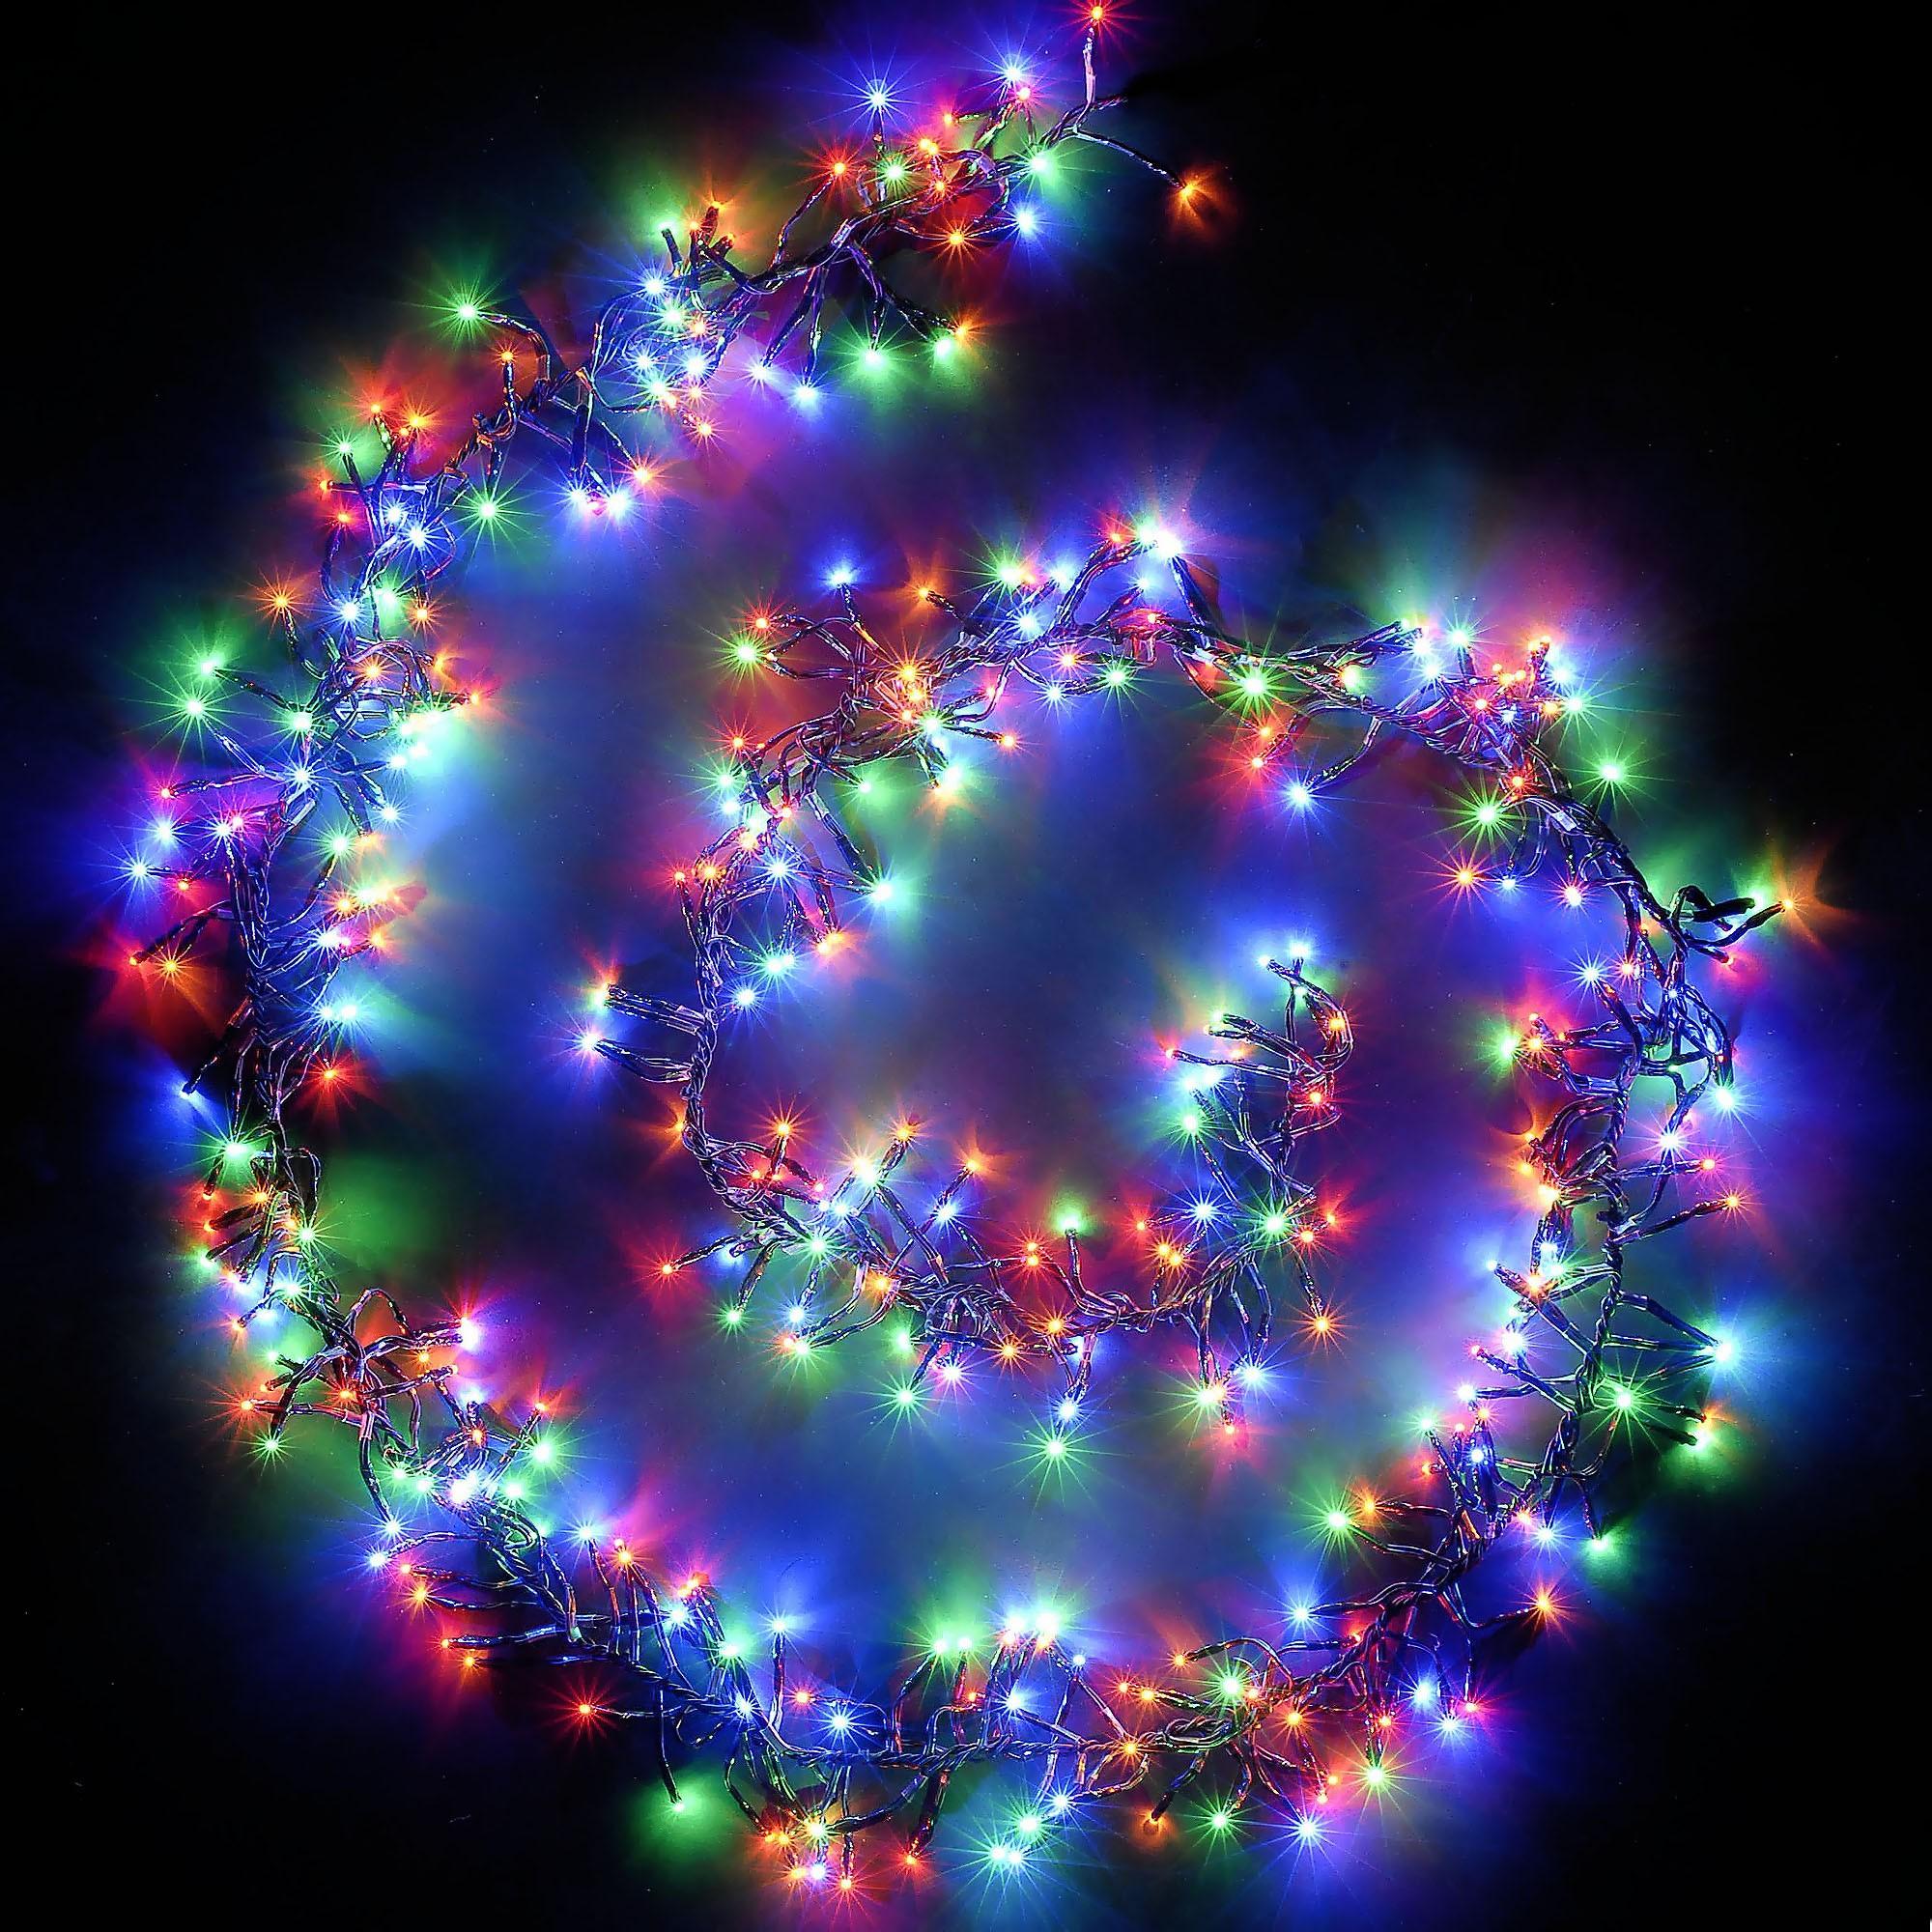 homebase lights diy warm light q led white ebay appealing string tesco fairy b south fl multi argos function africa outdoor leds solar ireland w